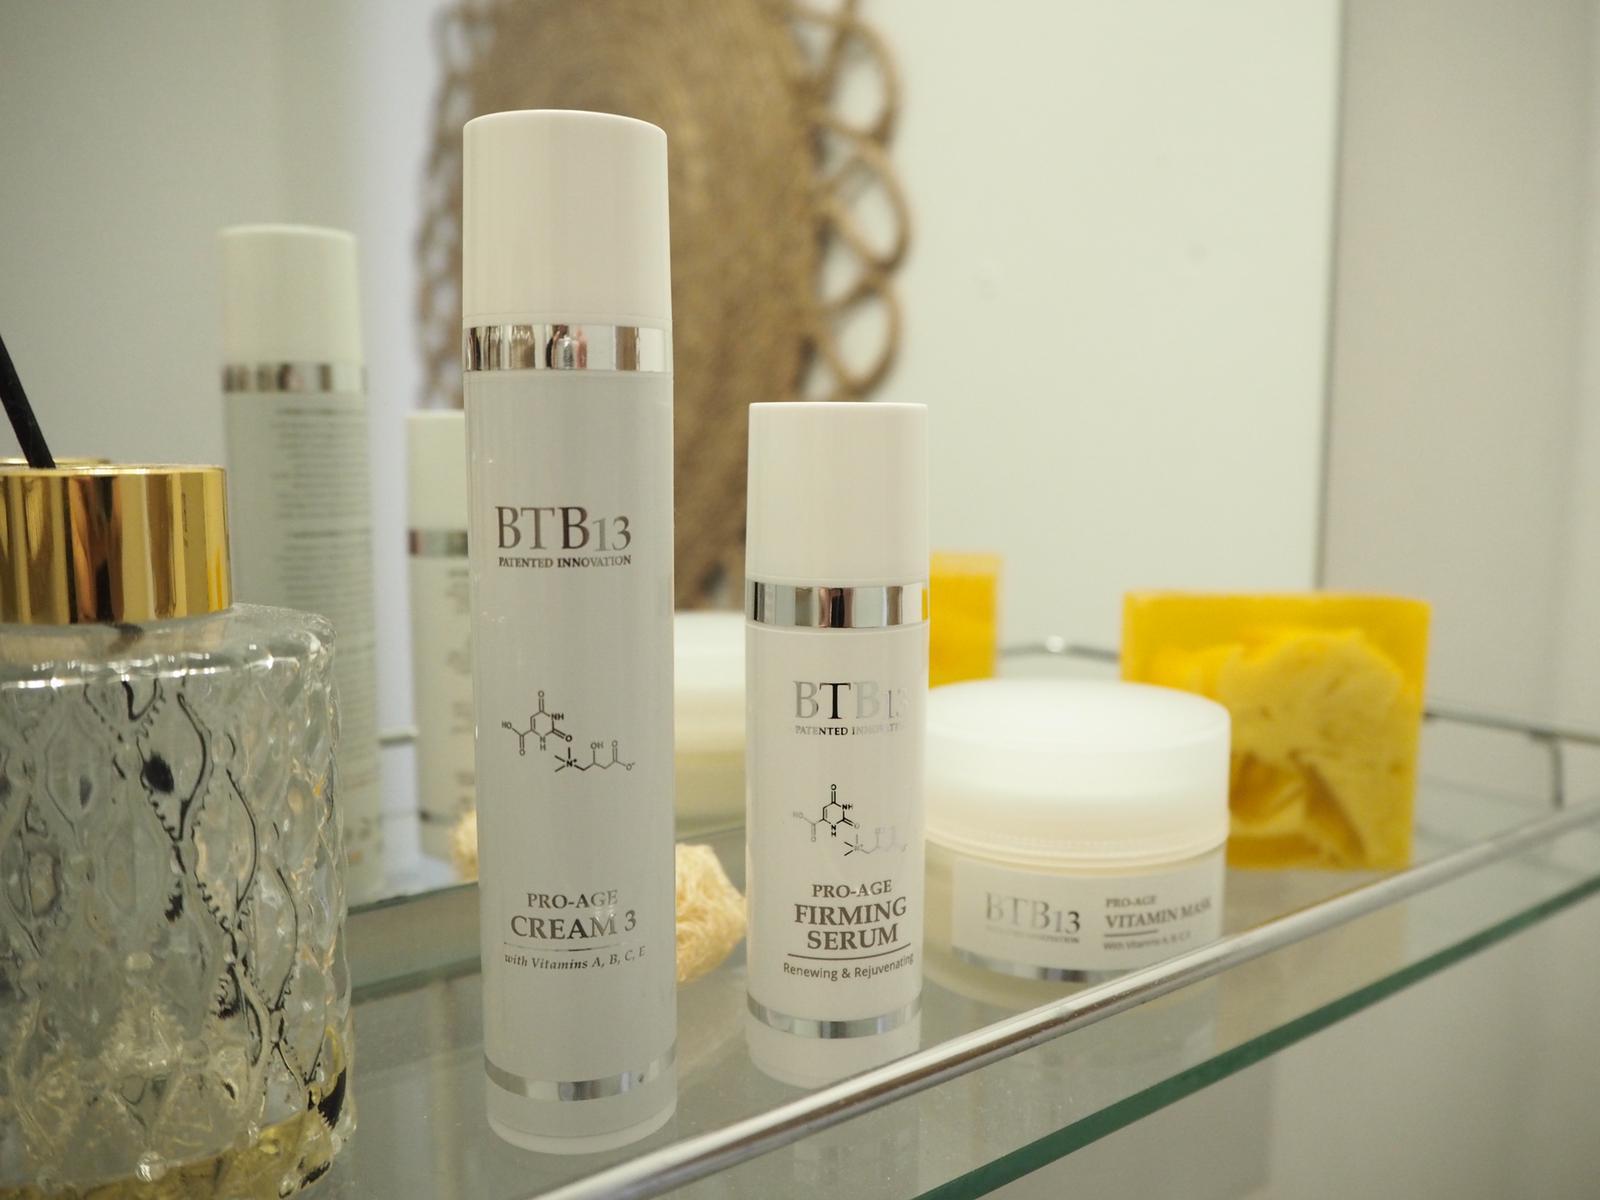 BTB13 Pro-Age Vitamin cream3 (50ml)